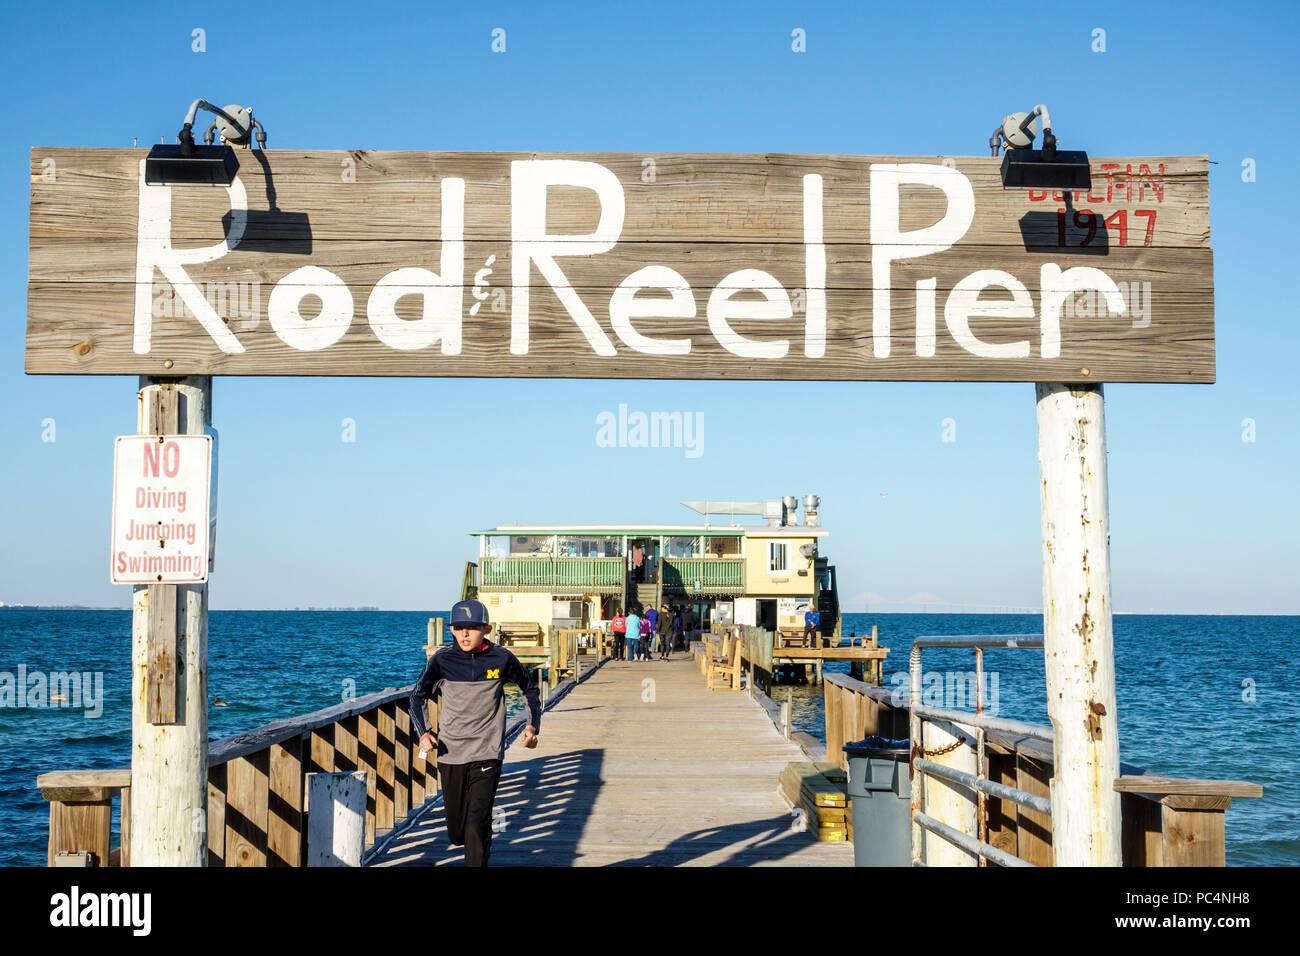 Florida Anna Maria Island Anna Maria City Pier Rod & Reel restaurant wood fishing pier rustic sign boy teen walking - Stock Image